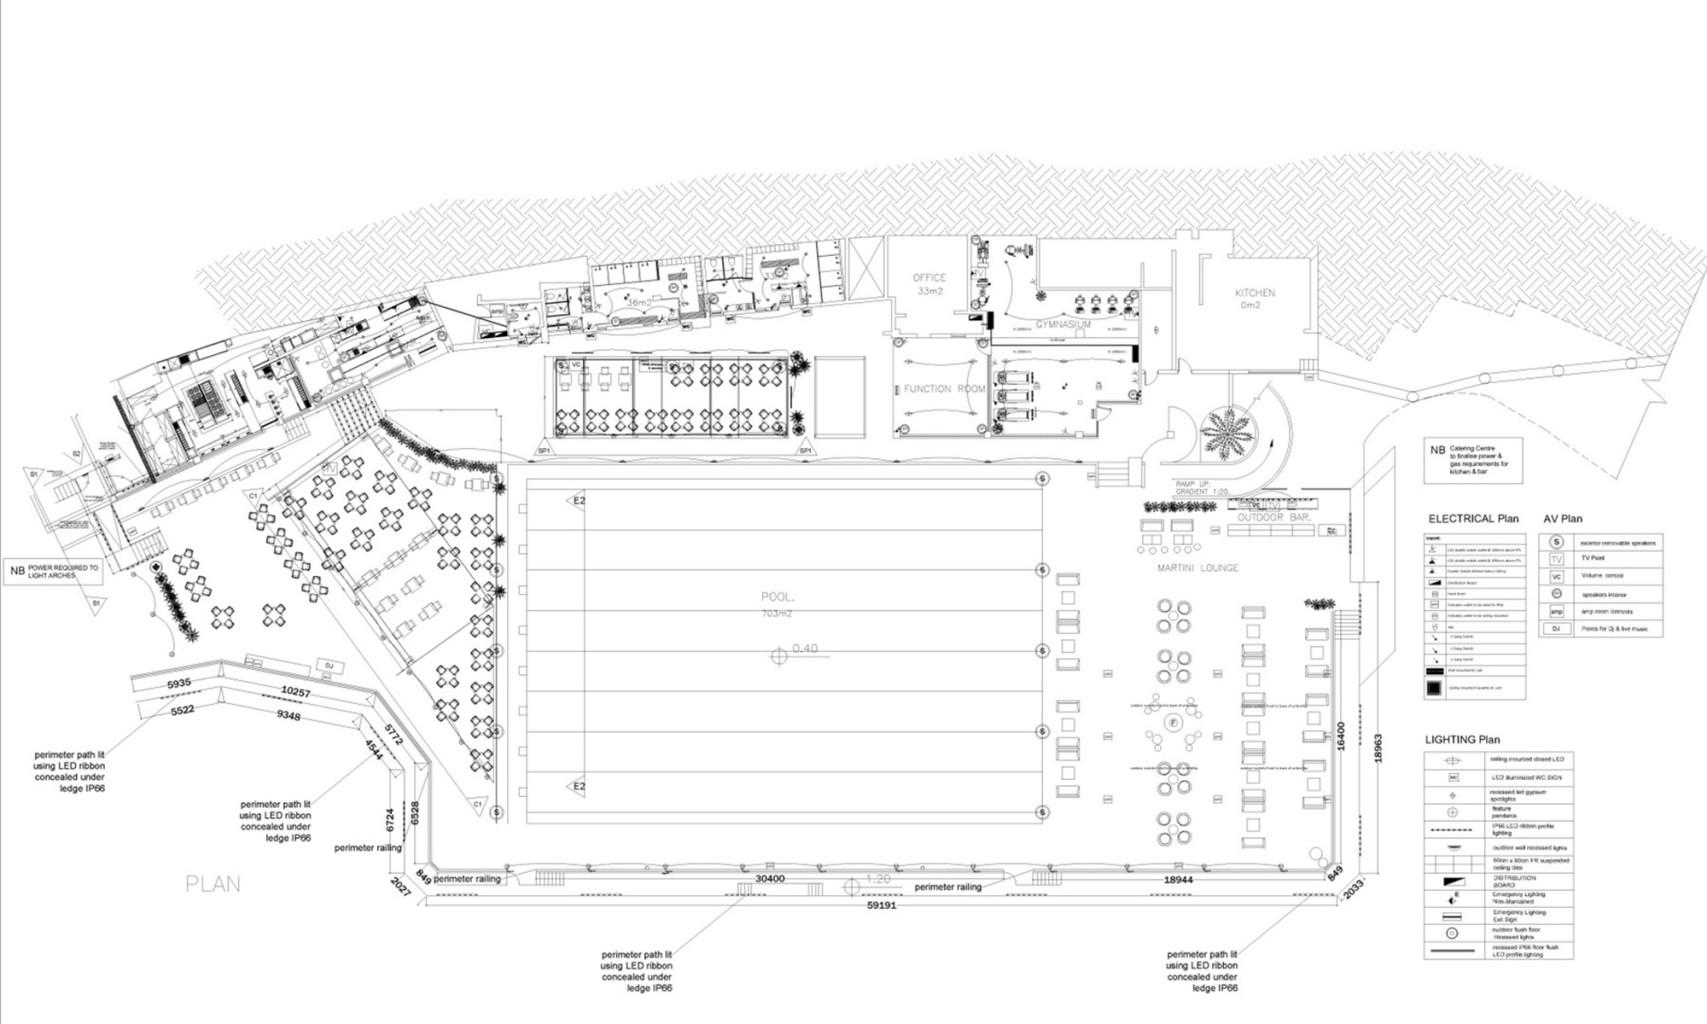 neptunes-layout-power-light-a1-1-150-copia